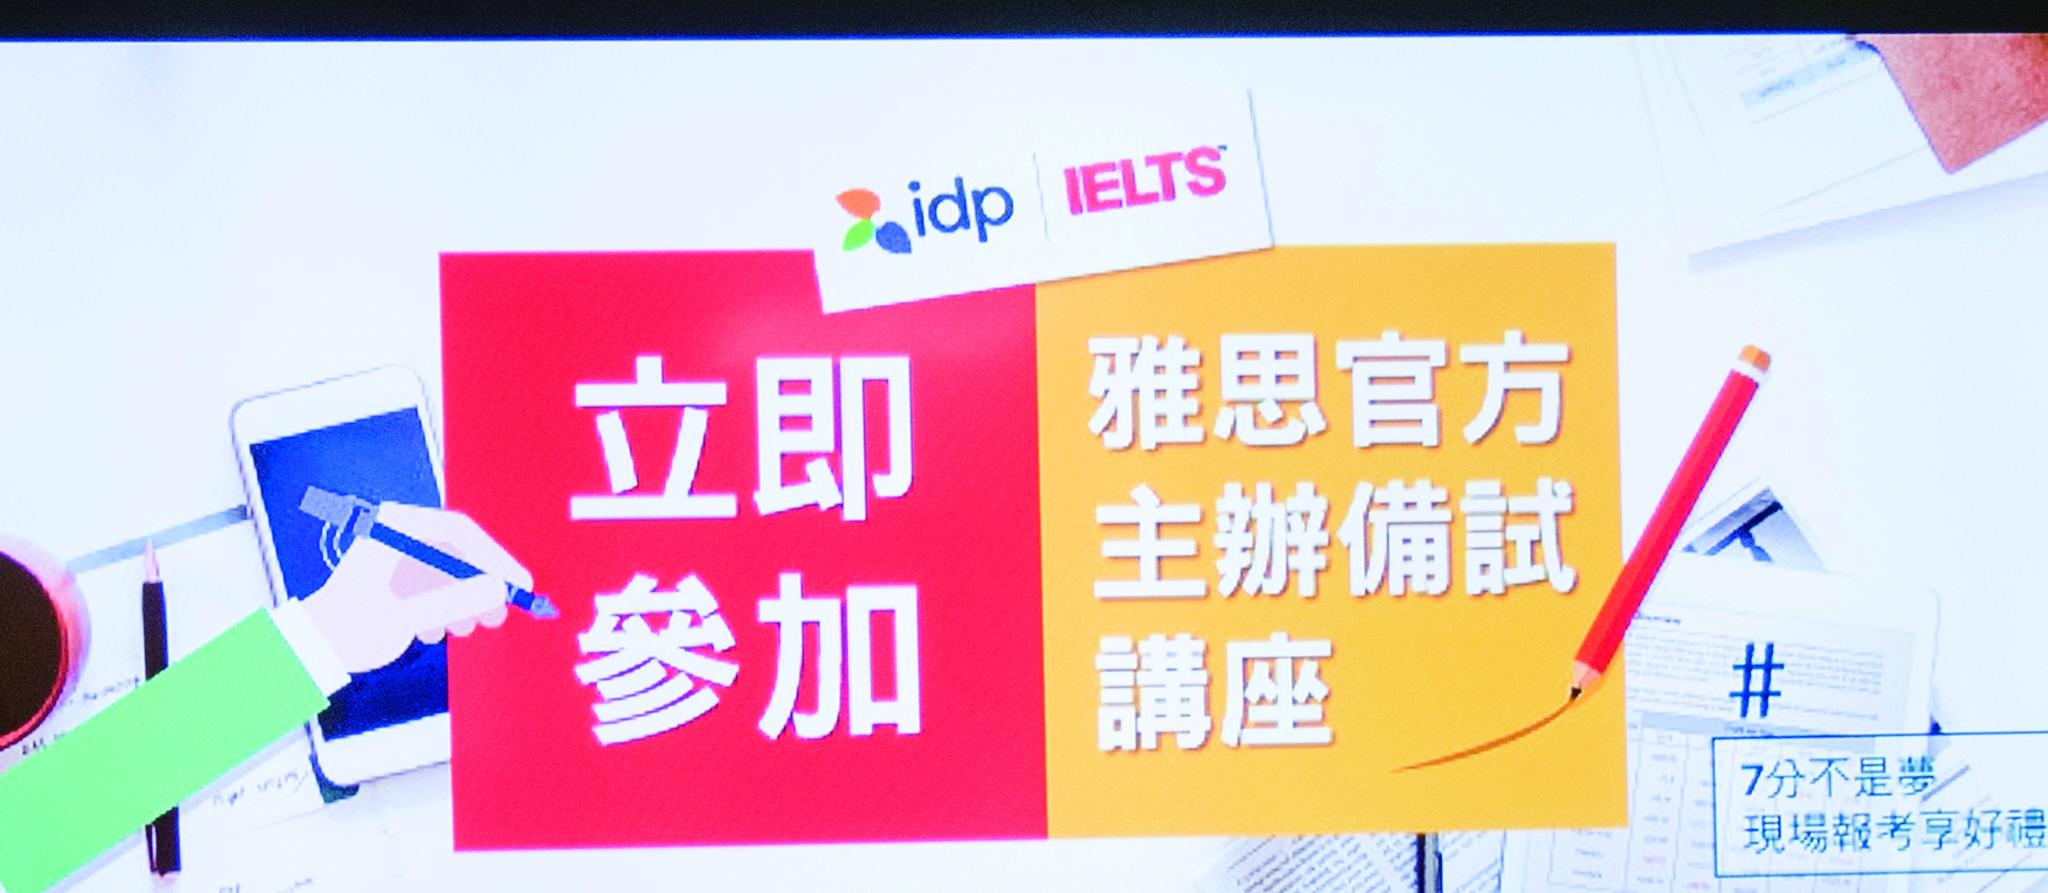 IDP於台北、台中與高雄均設有辦公室,就近提供留遊學服務及雅思考試。